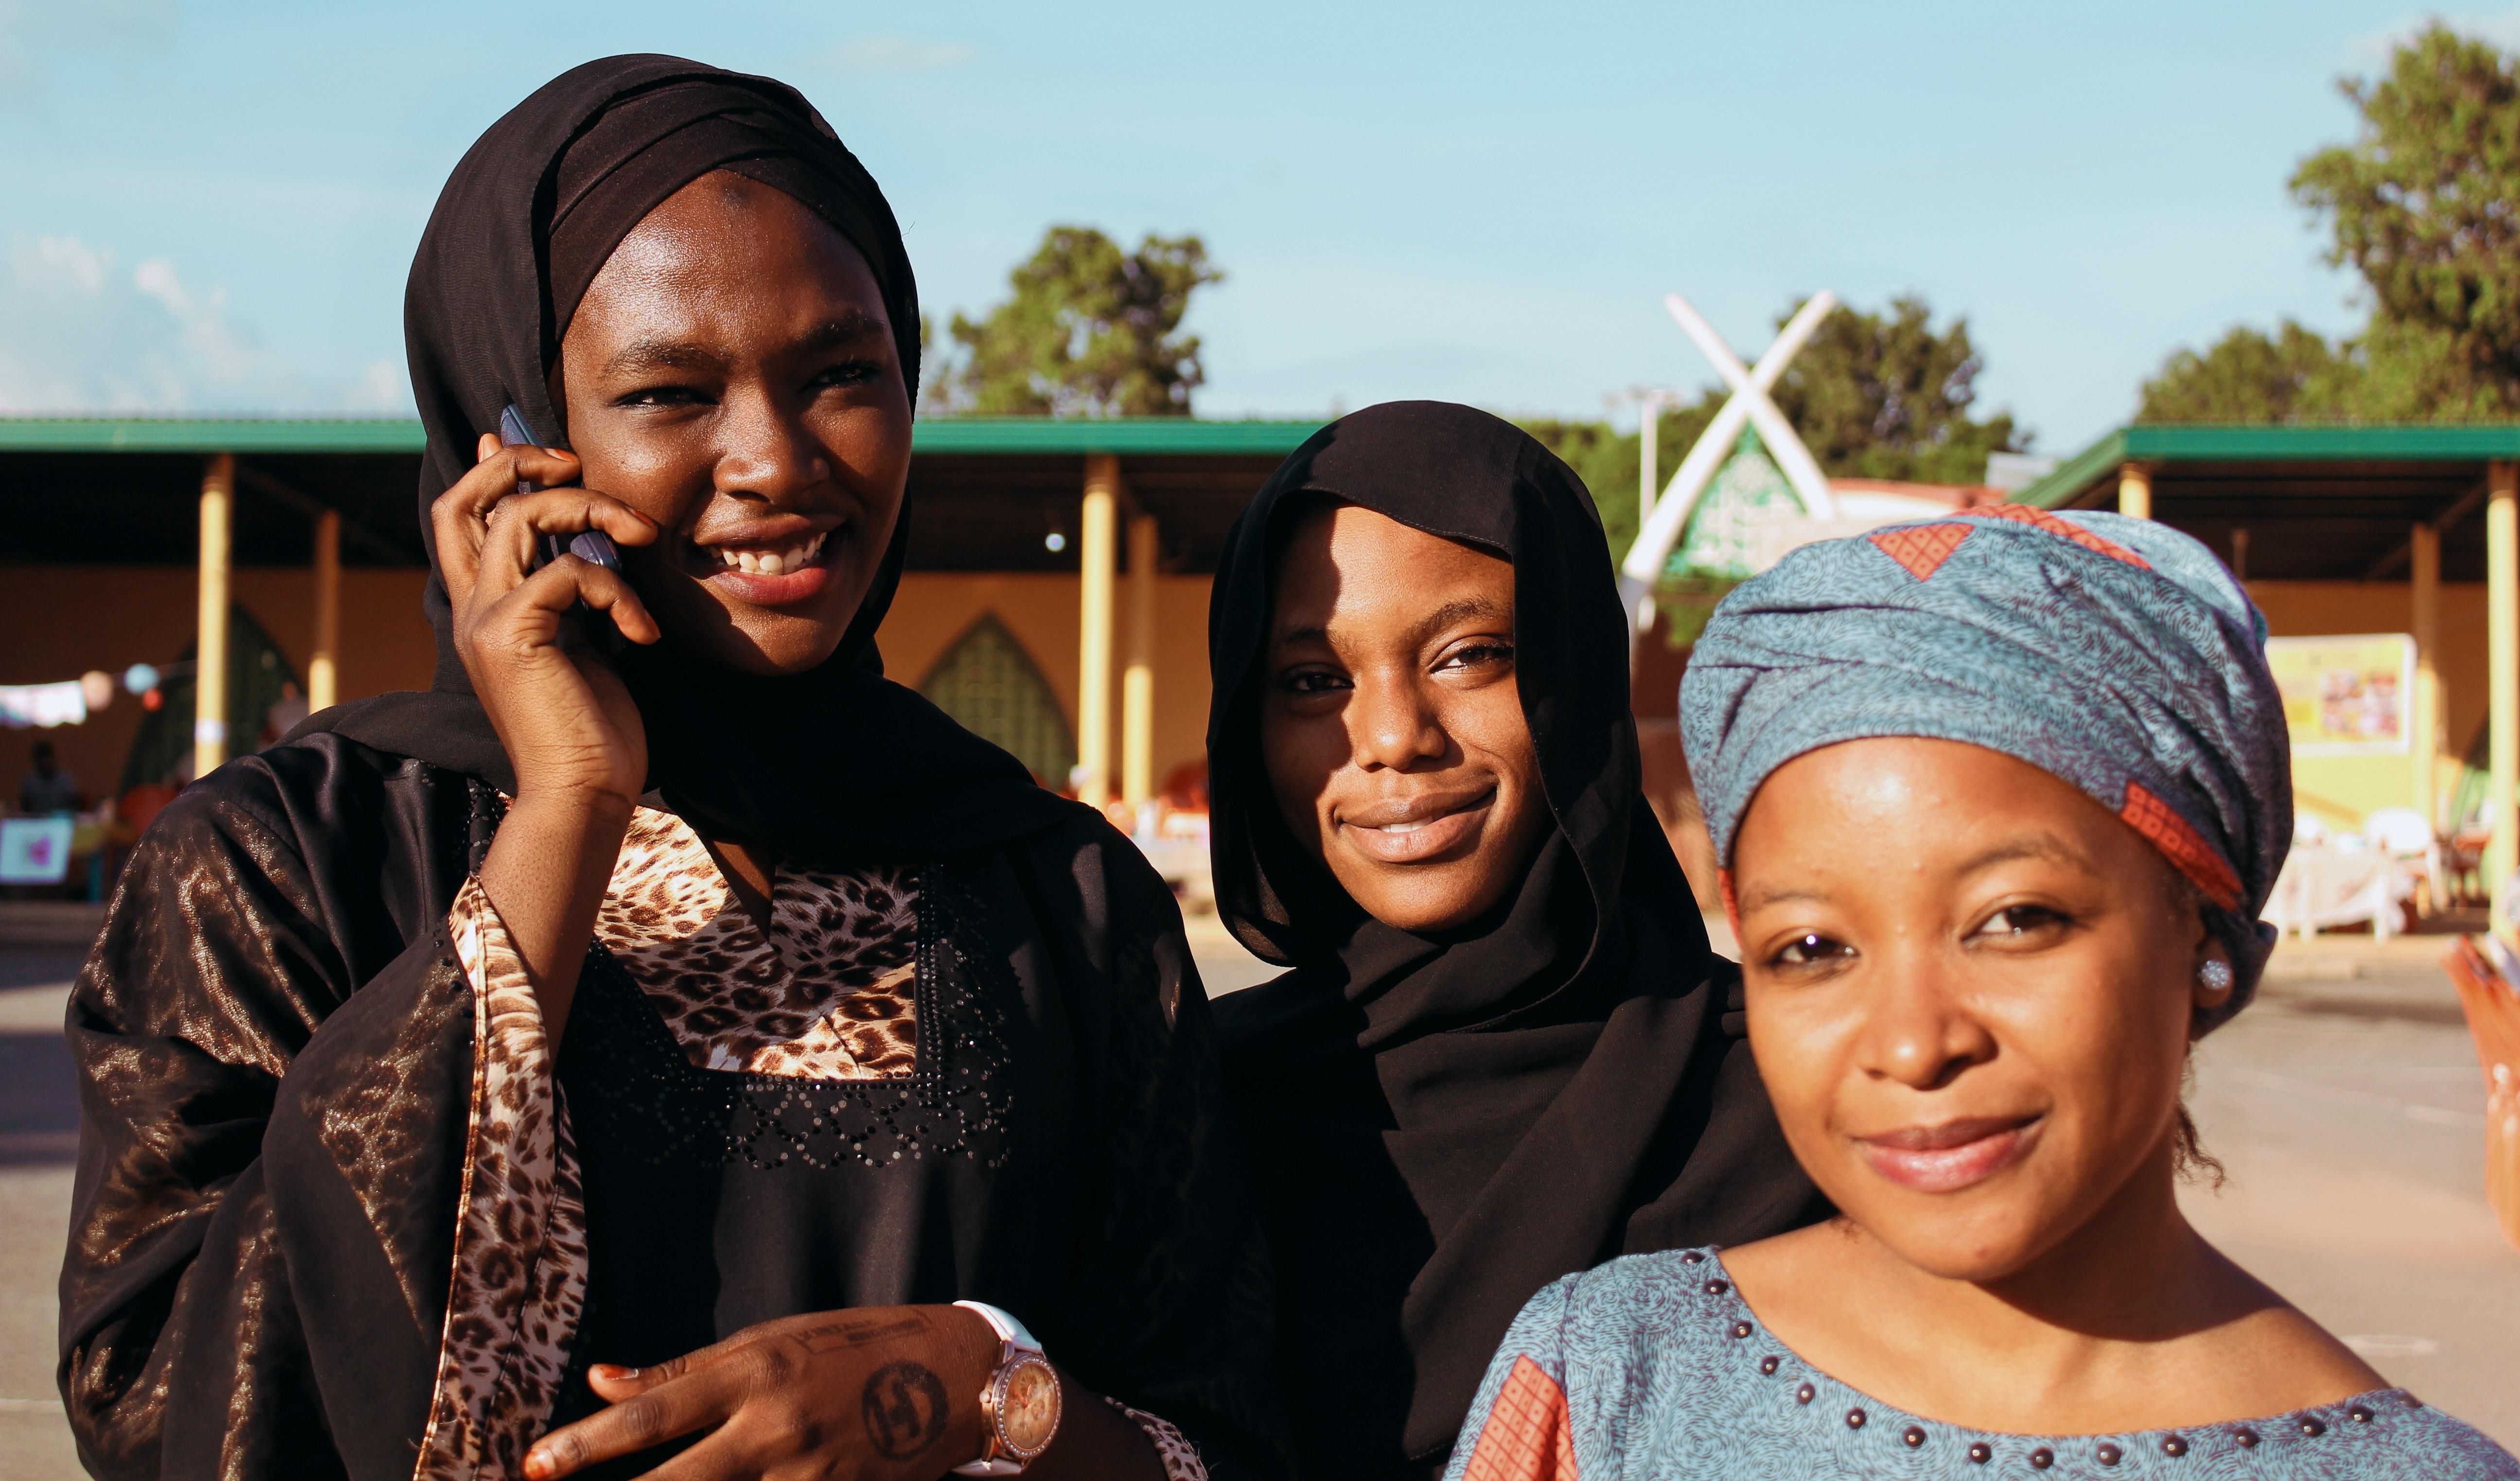 Nigeria: can reconciliation happen?